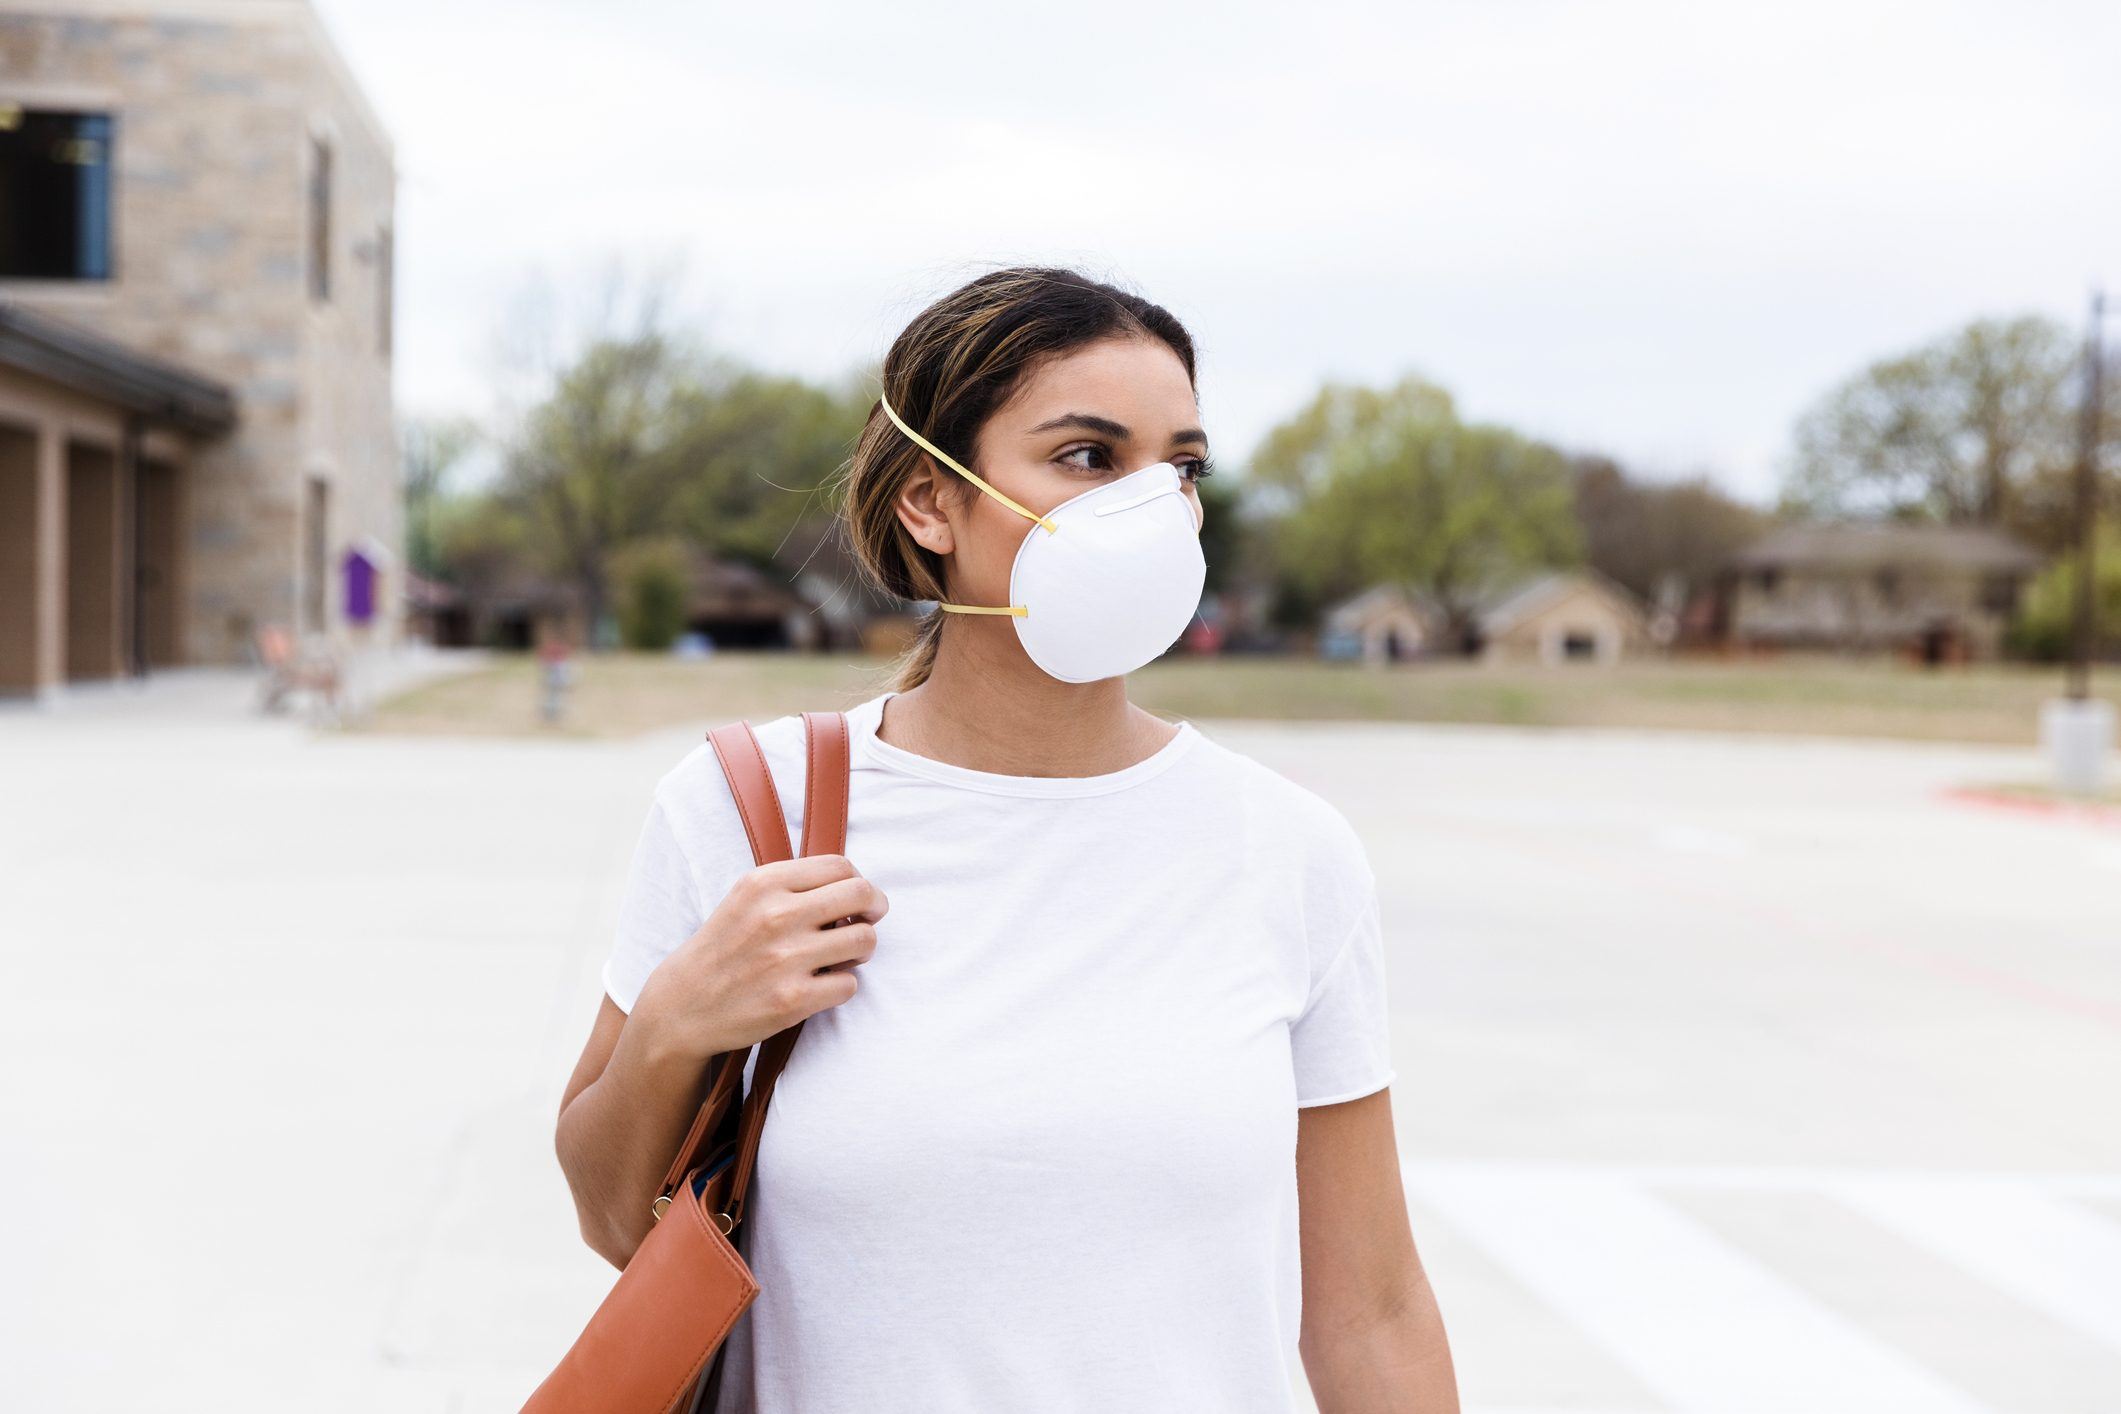 Woman crosses the street wearing an N95 mask